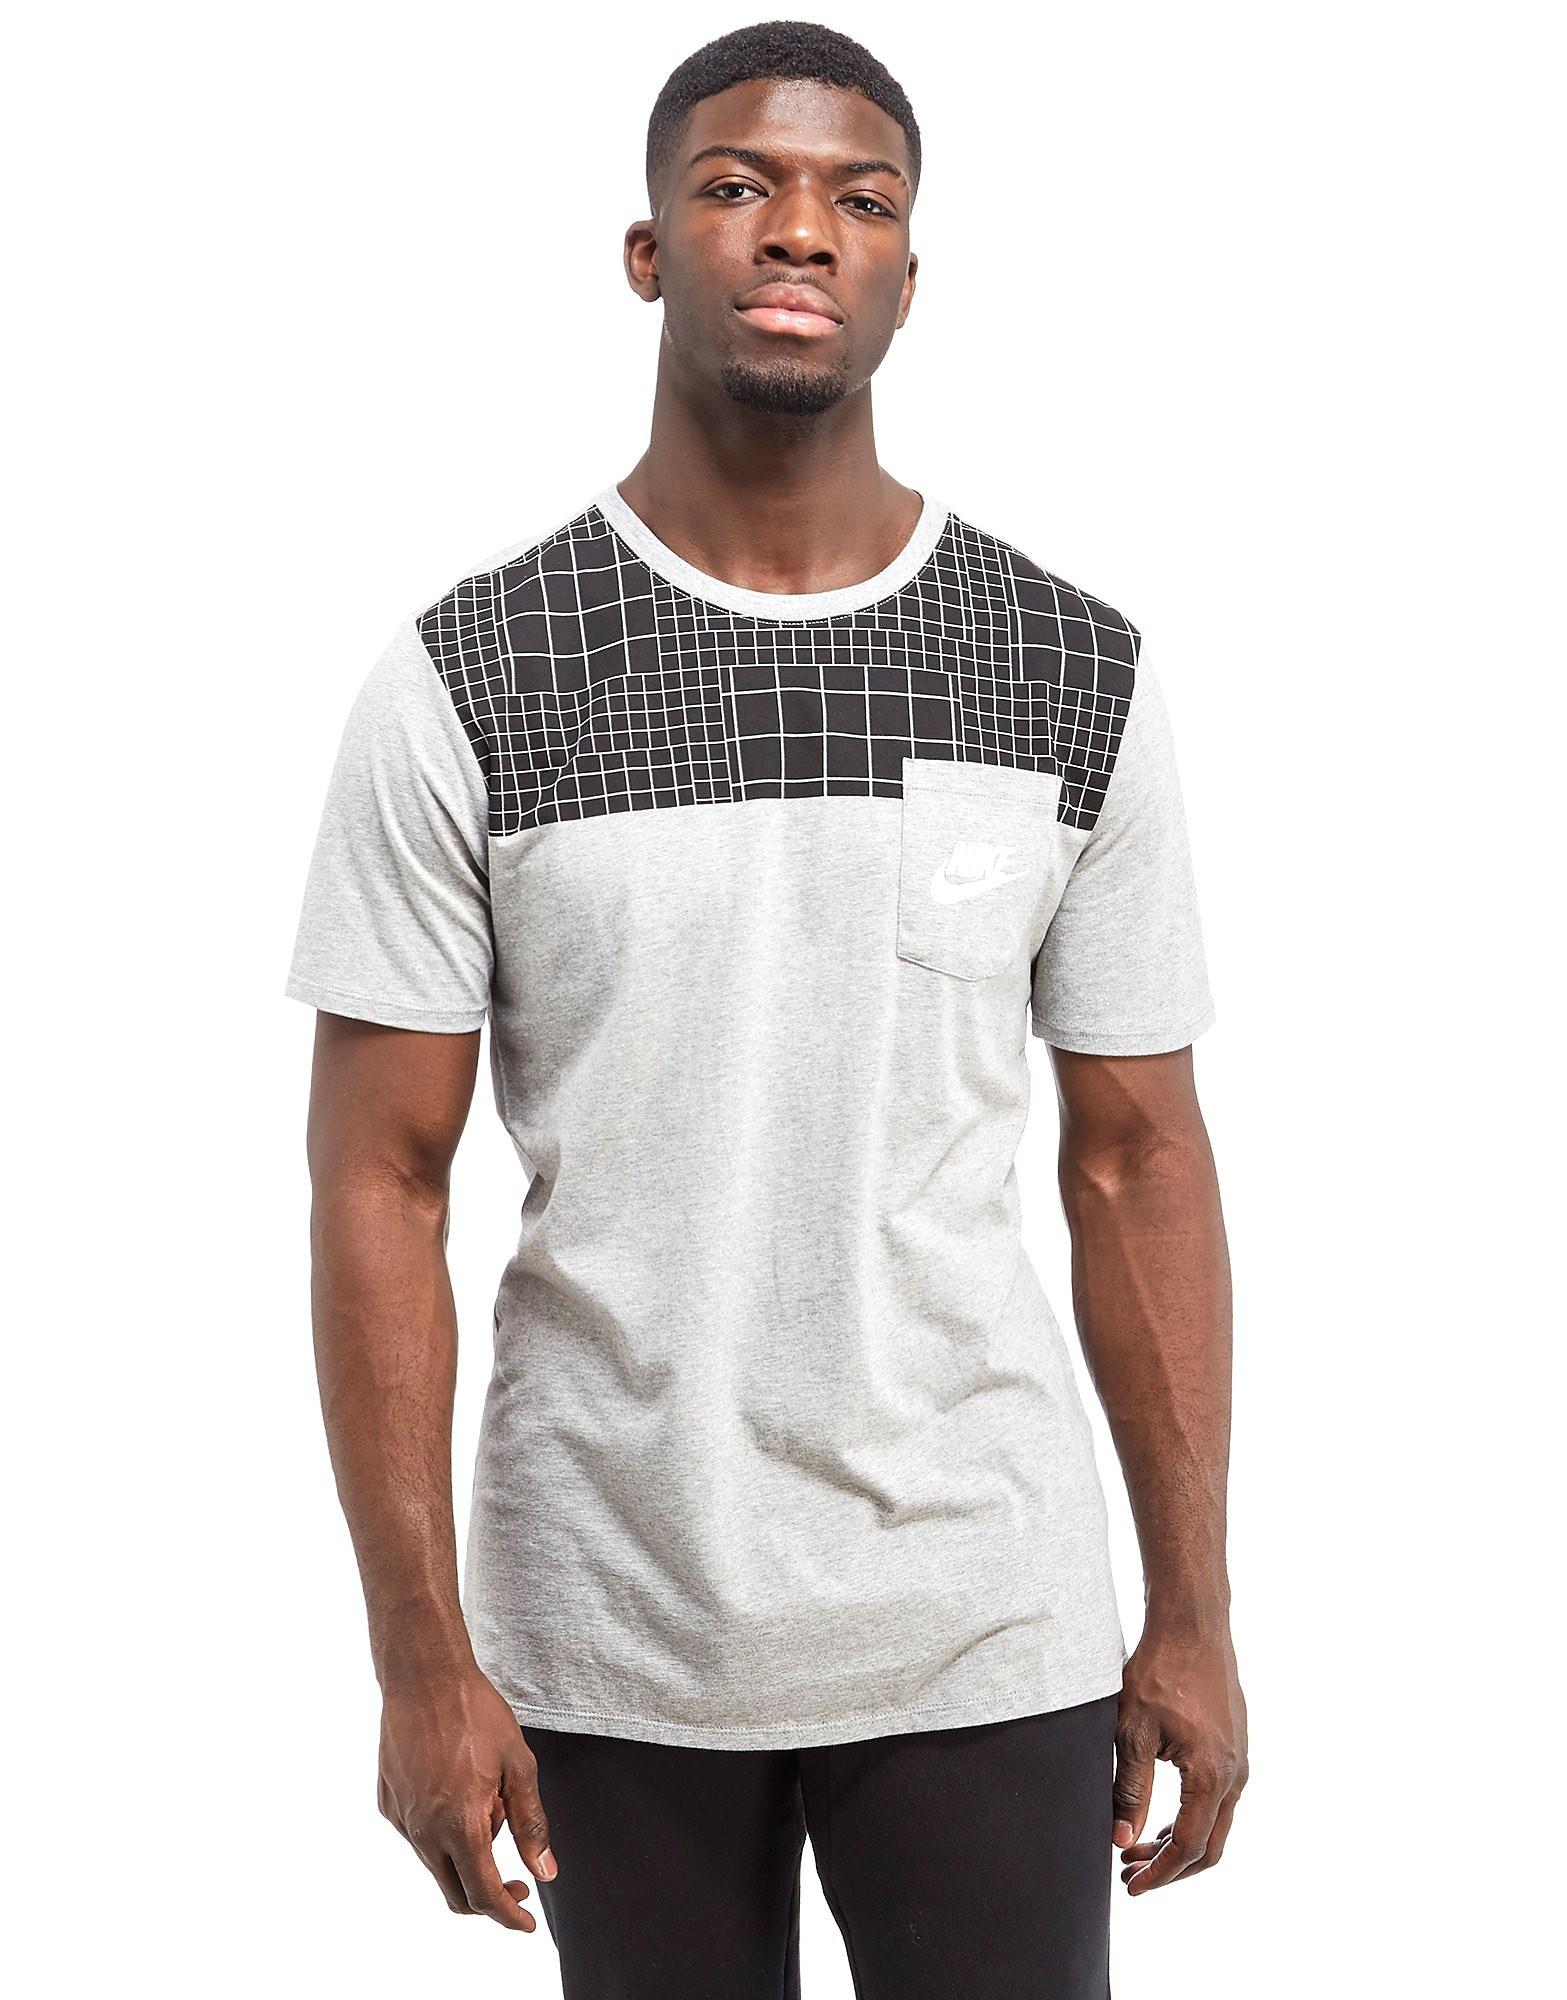 Nike Advance Pocket T-Shirt